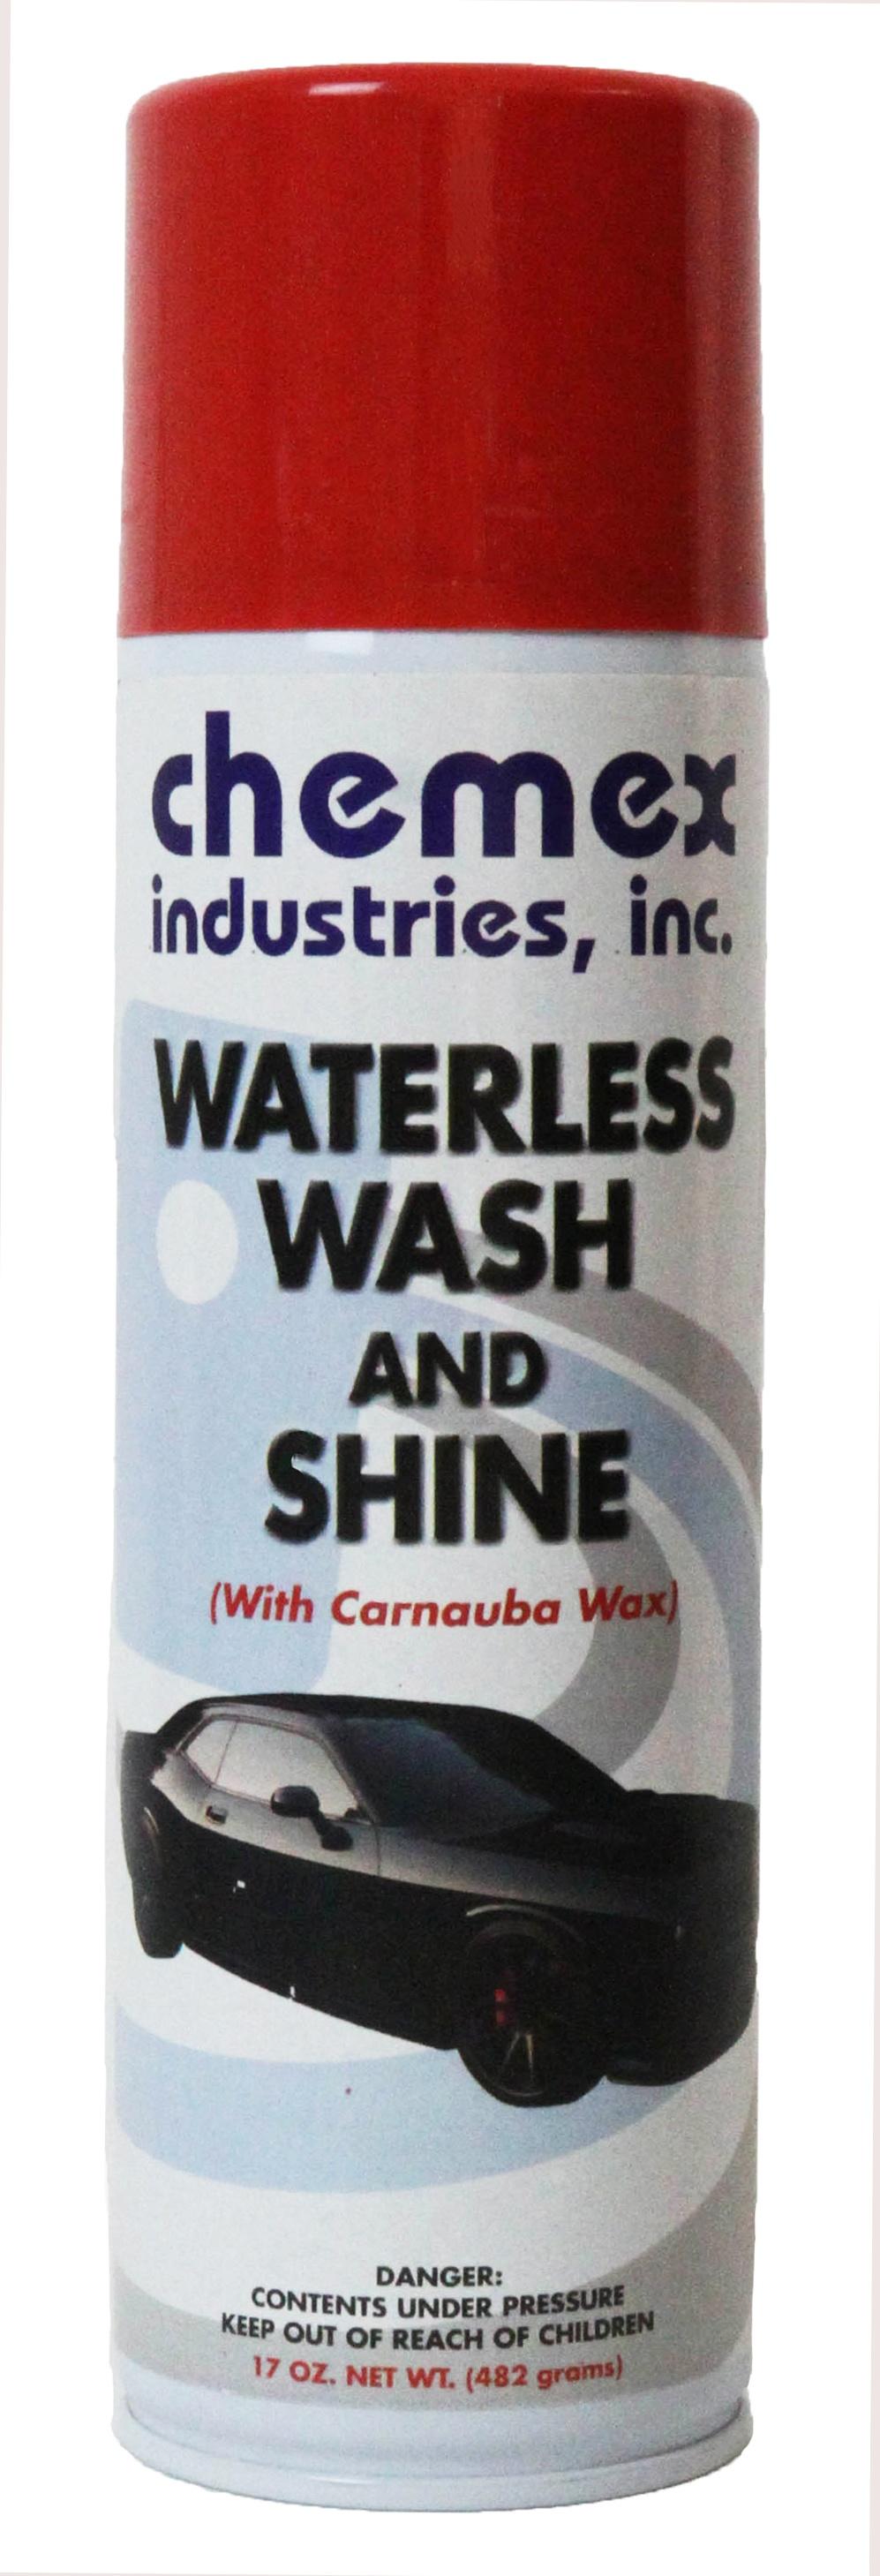 Waterless Wash and Shine_FA_CROPPED.jpg